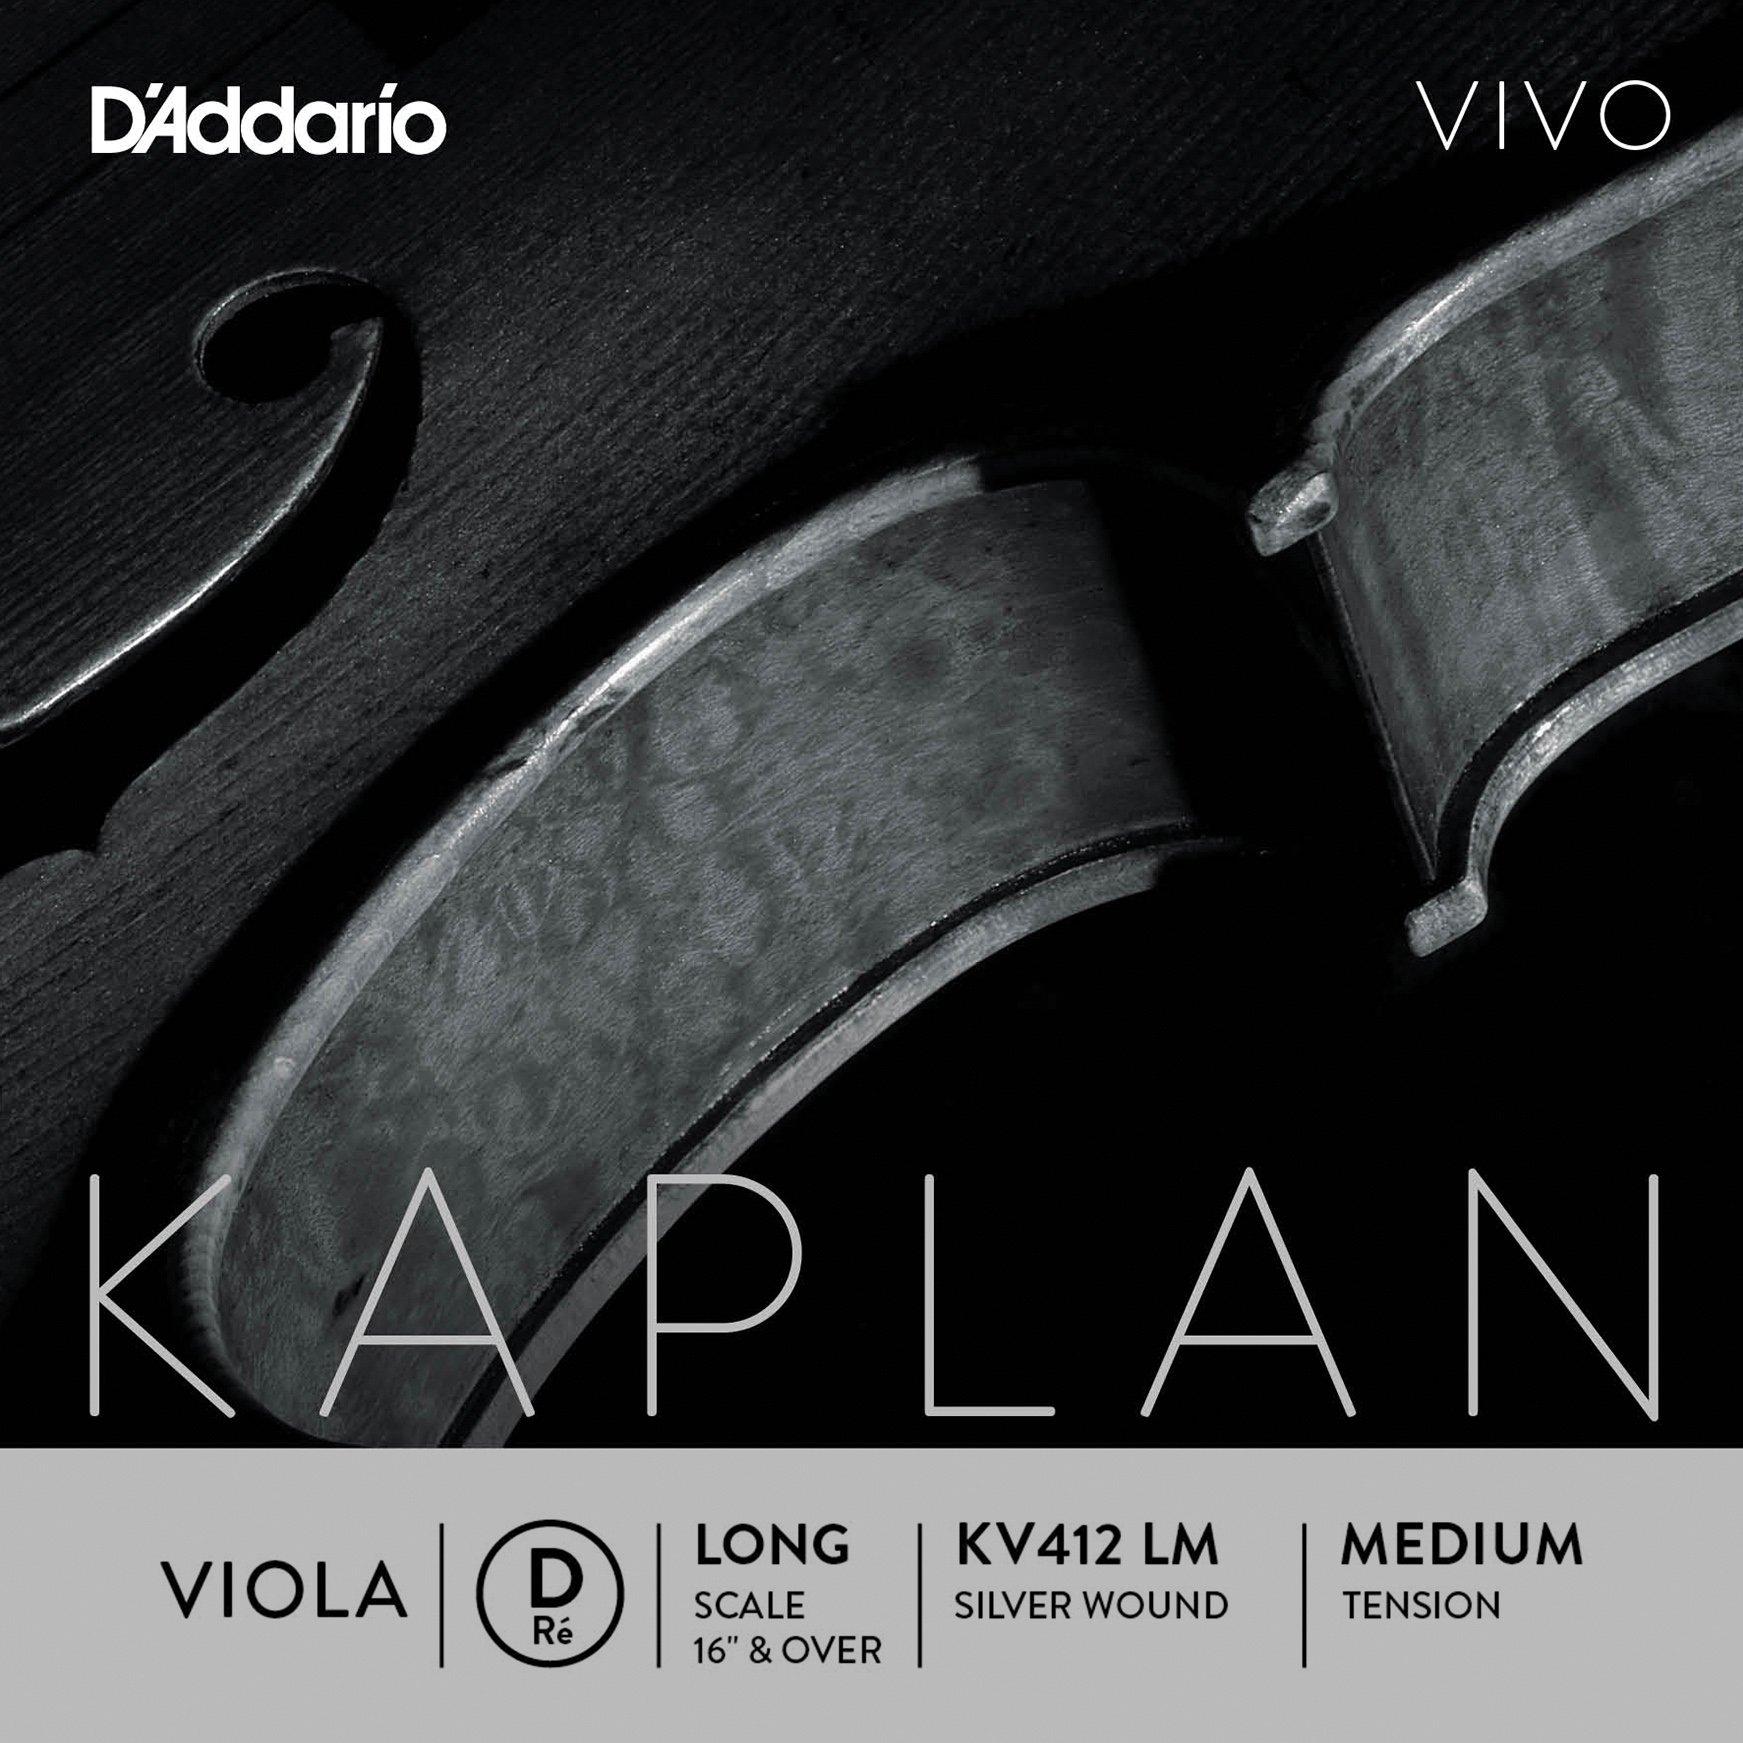 D'Addario KV412 LM Kaplan Vivo Viola D String